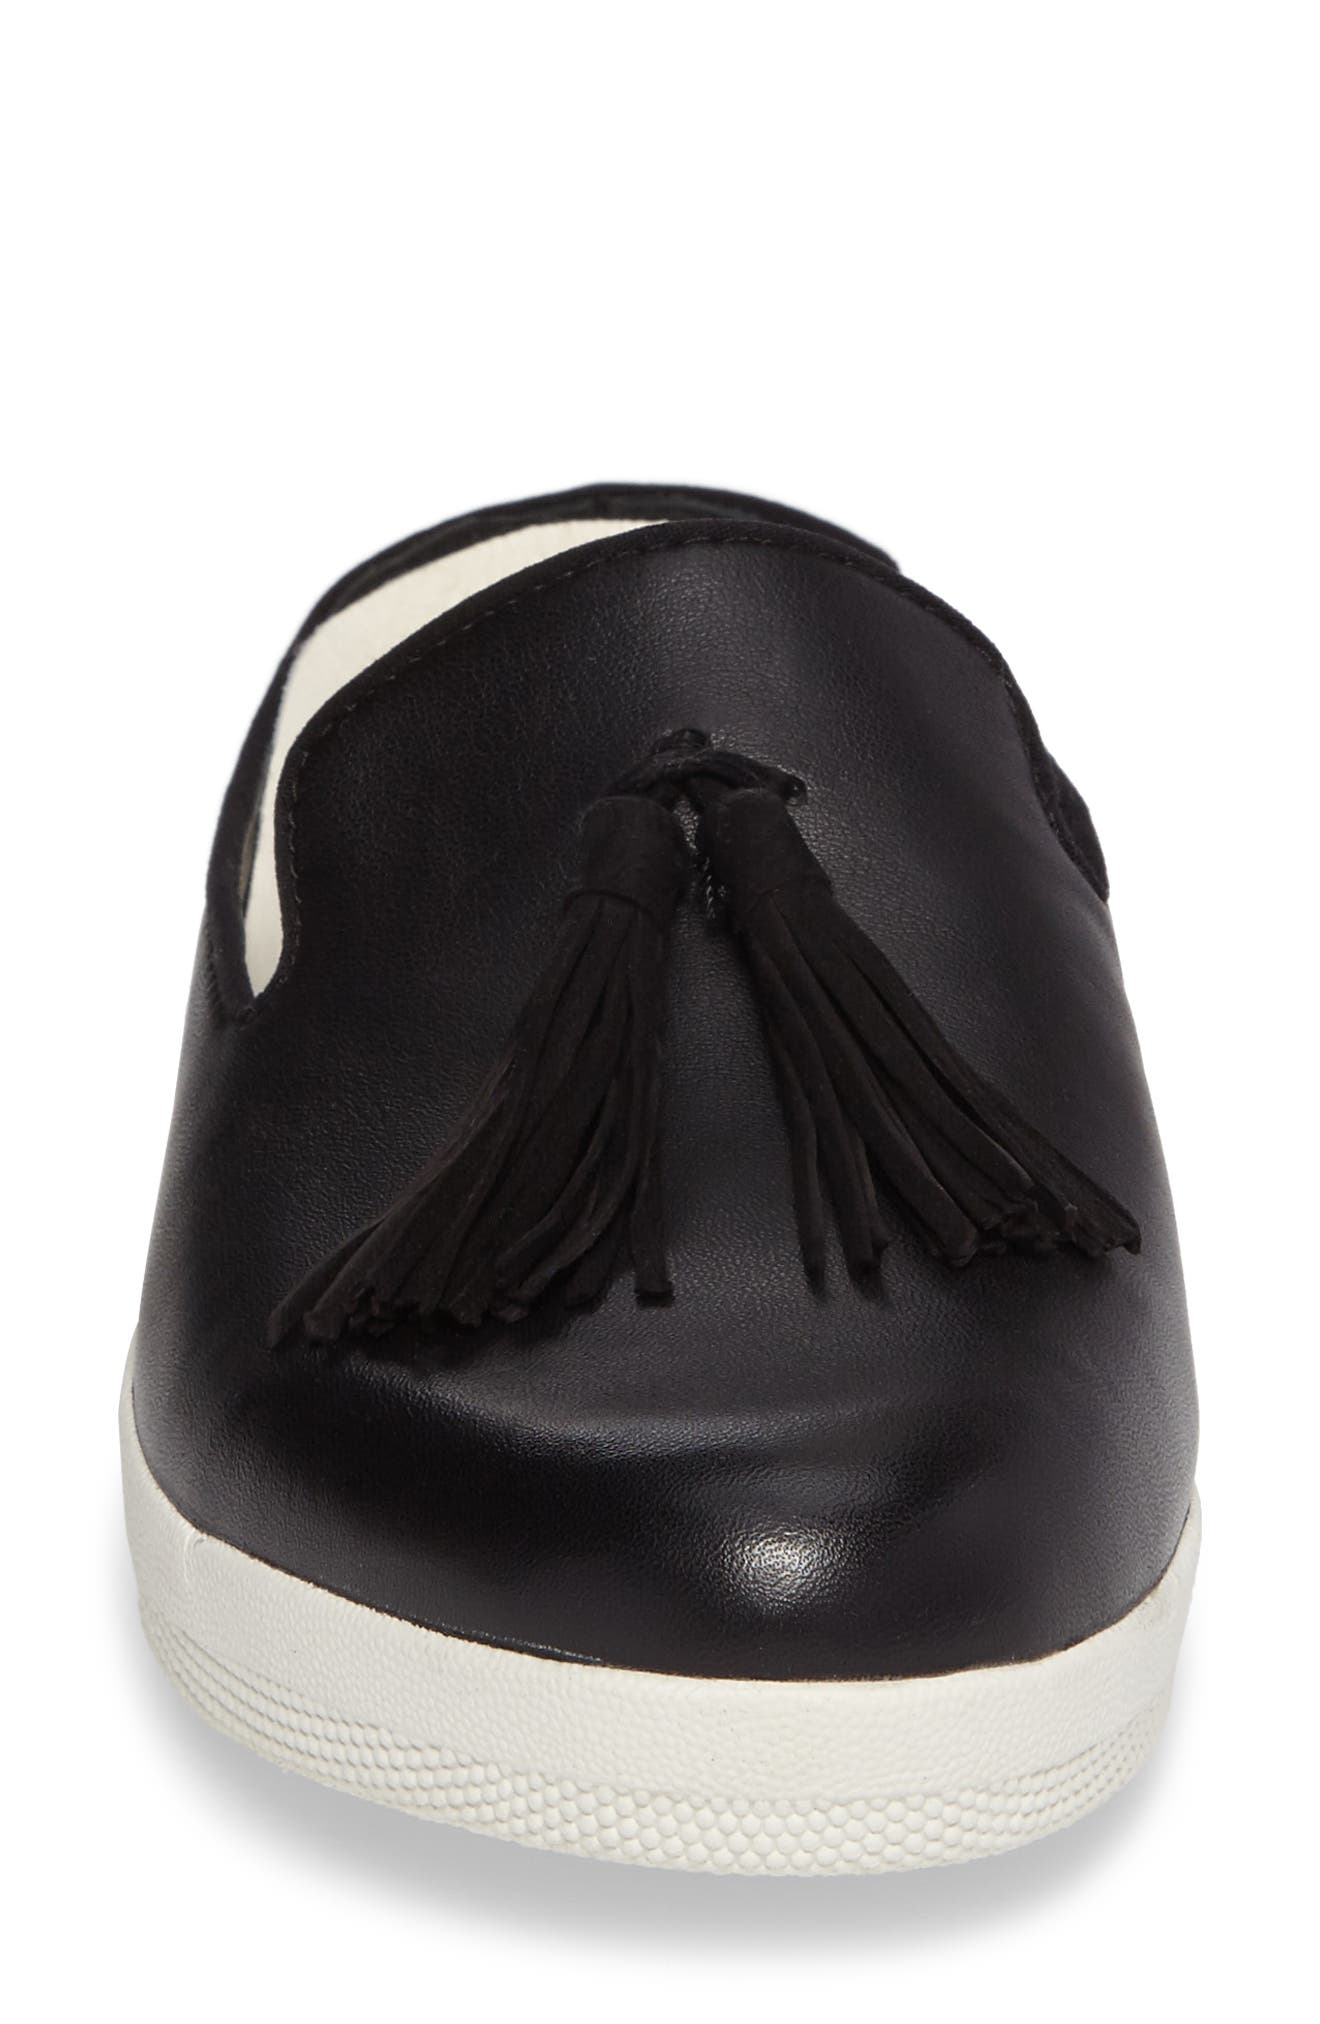 Alternate Image 4  - FitFlop Superskate Tasseled Loafer Mule (Women)